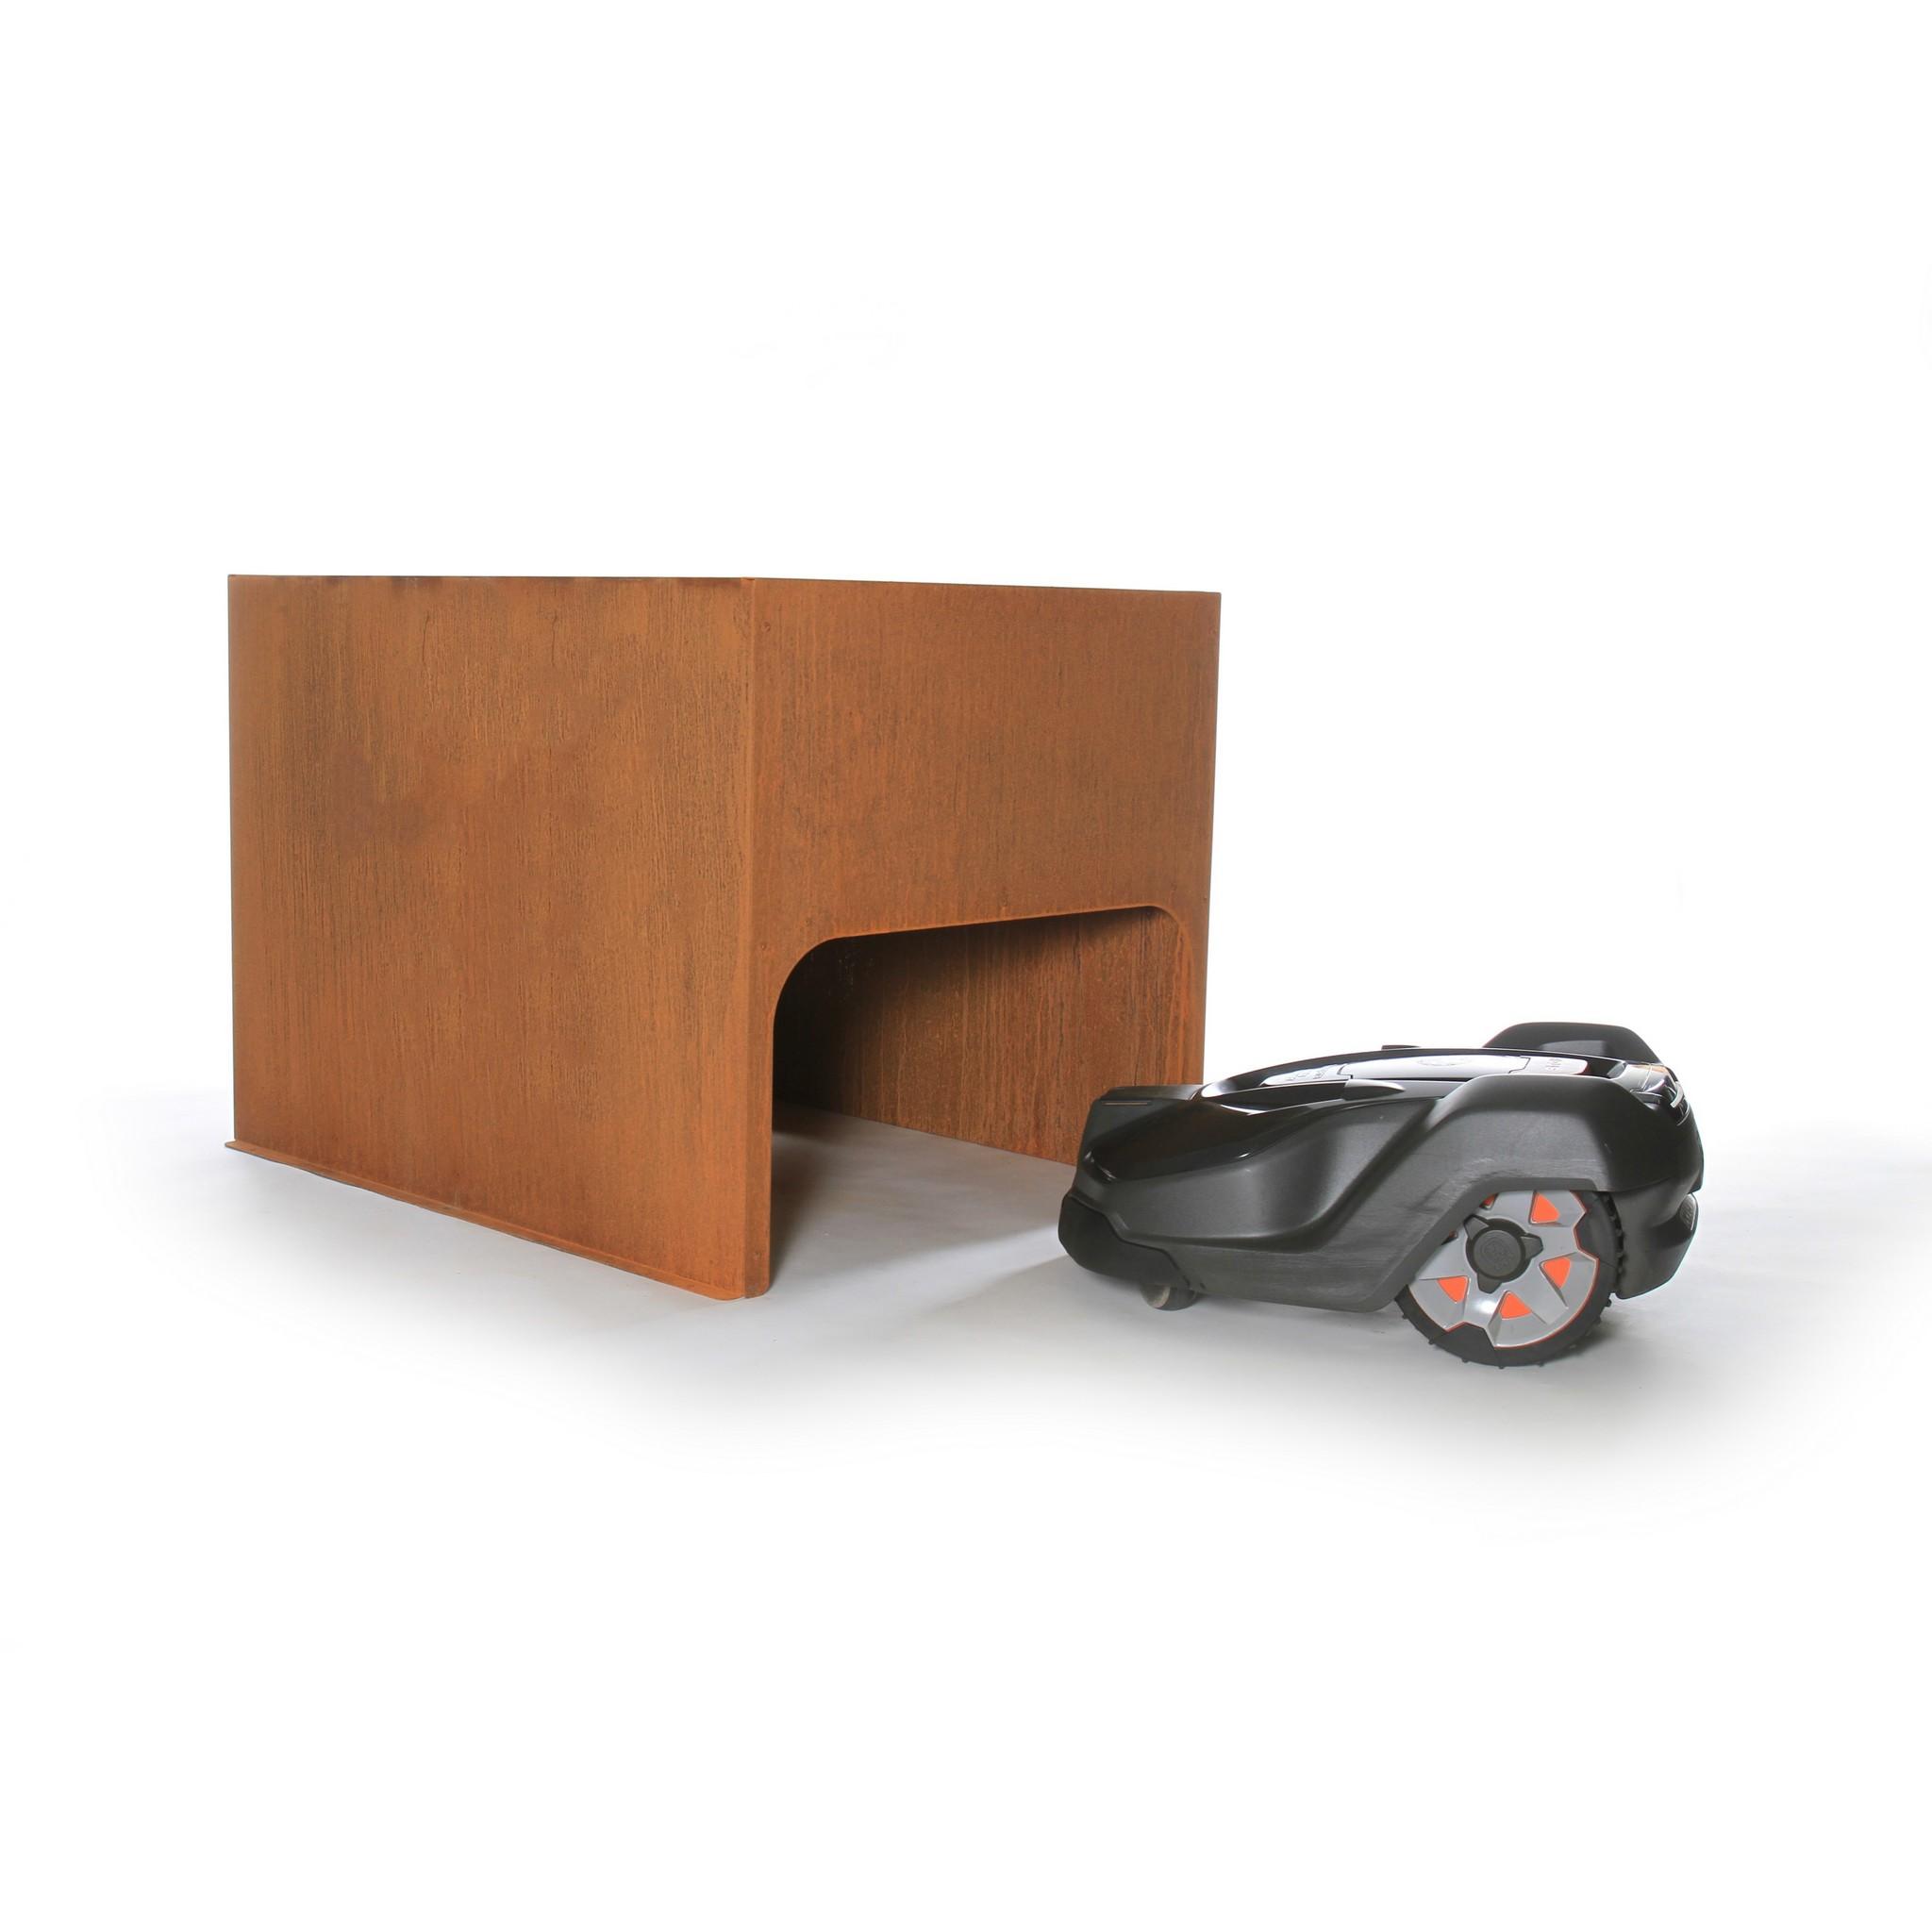 Robotmaaier garage model Plantenbak